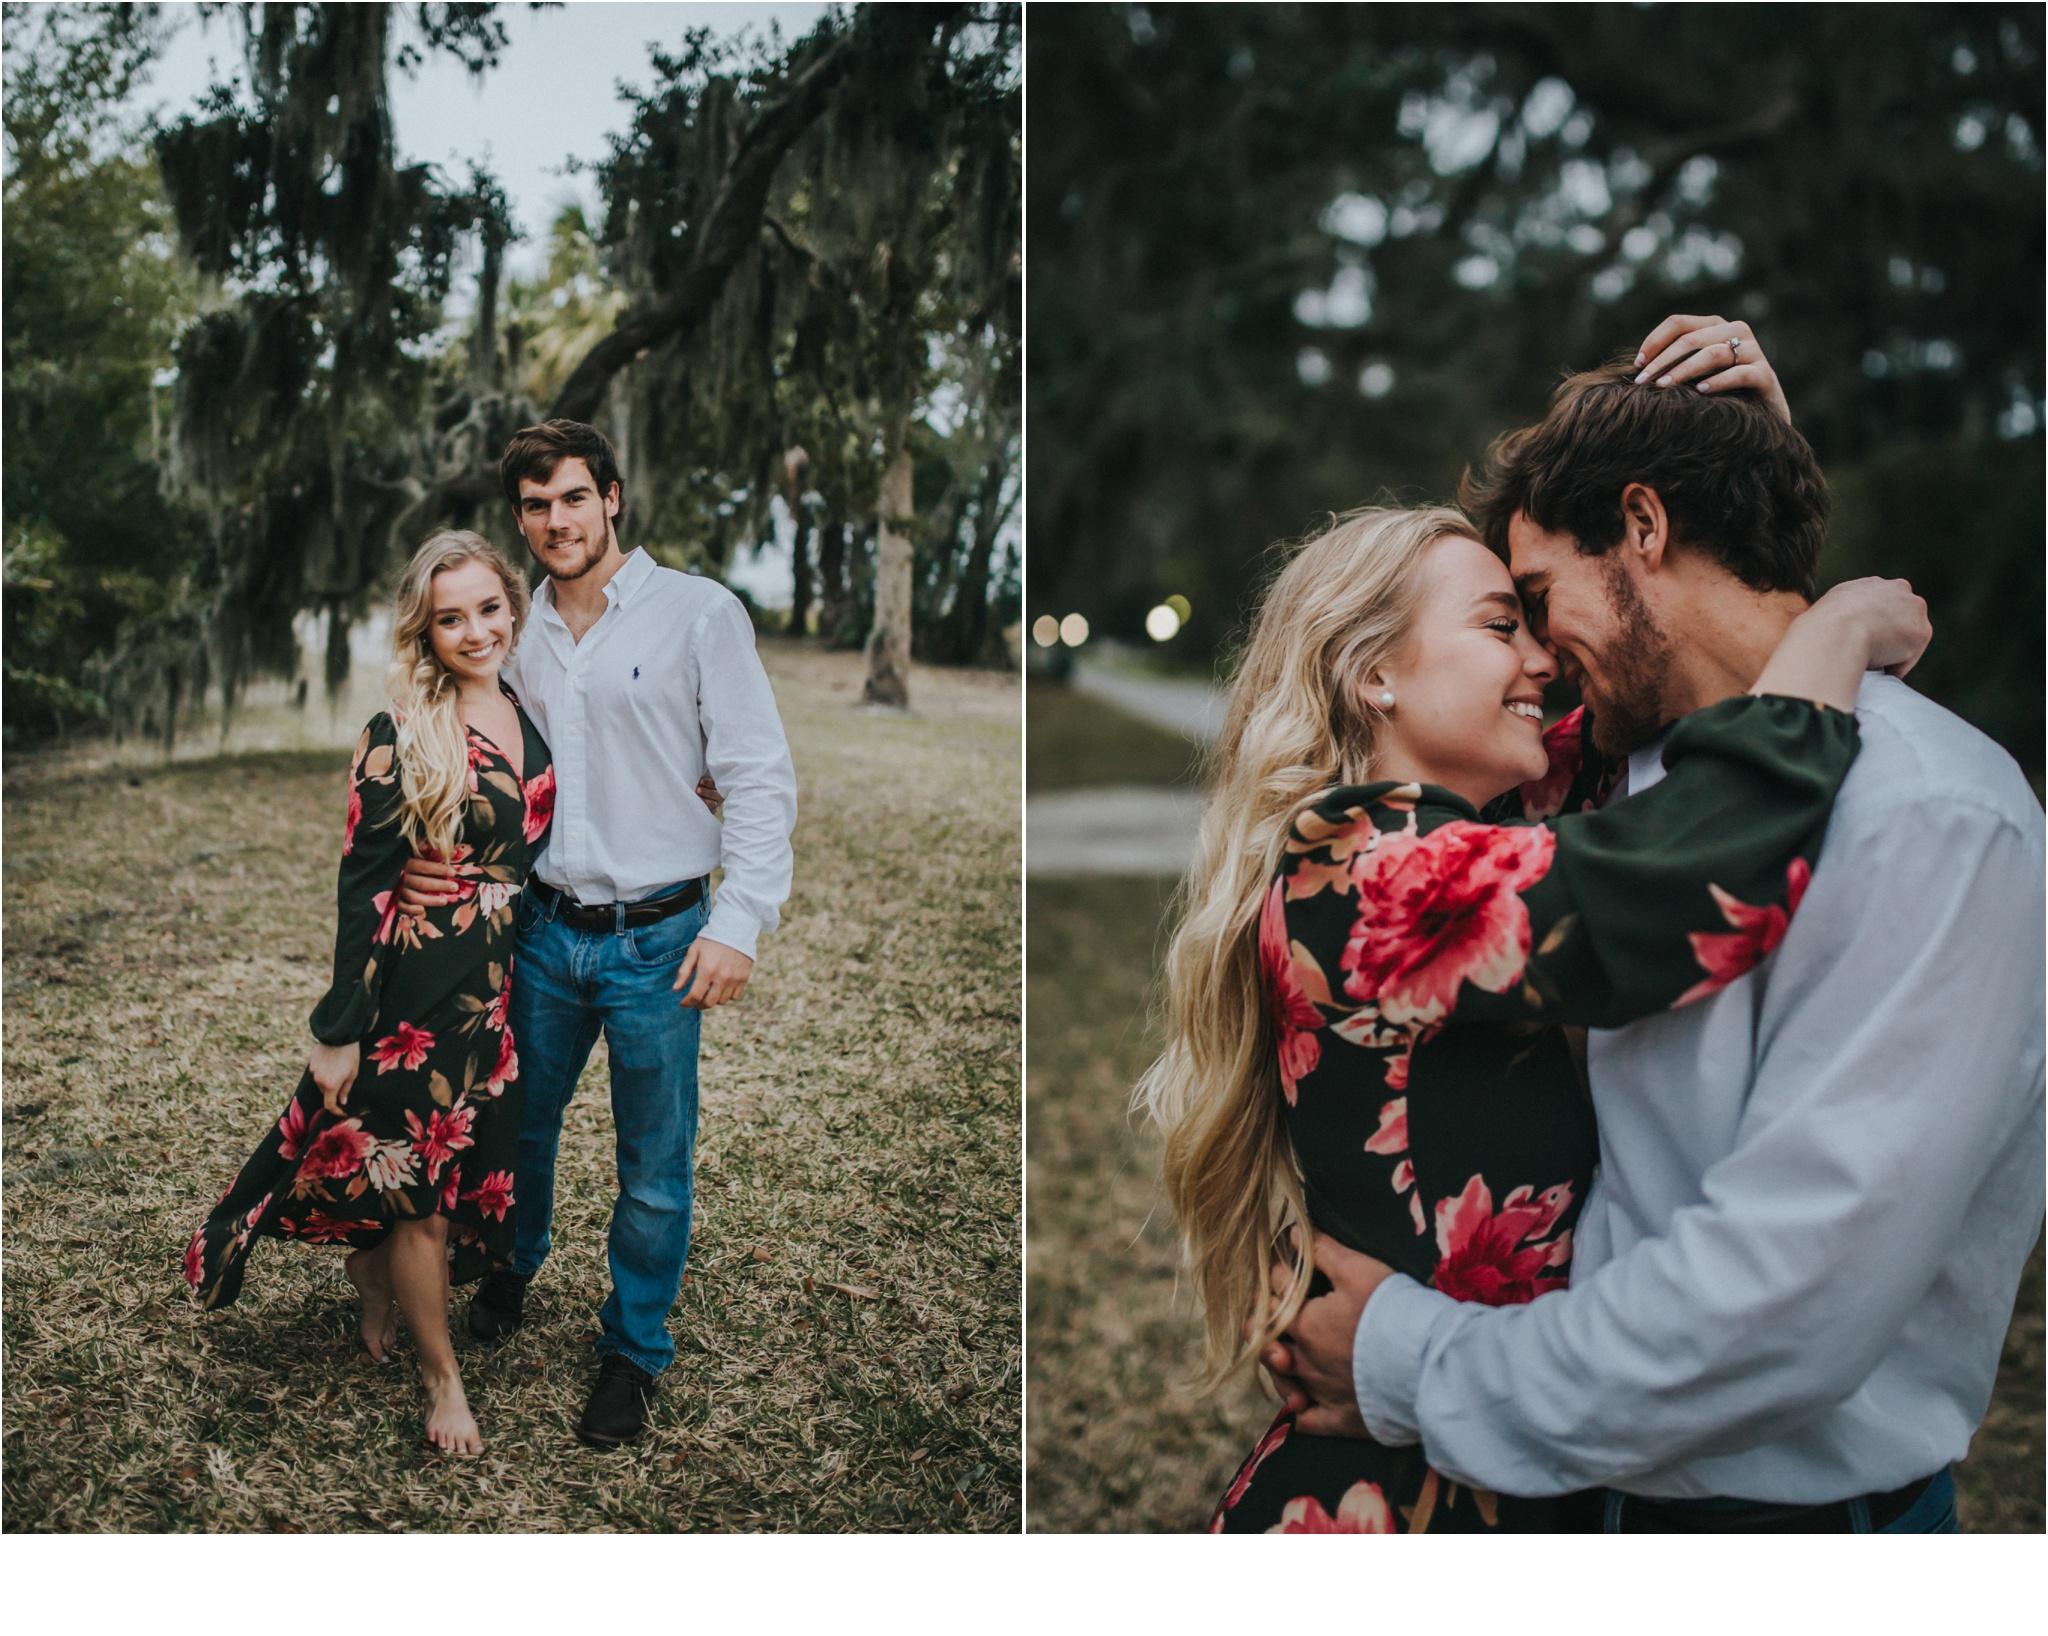 Rainey_Gregg_Photography_St._Simons_Island_Georgia_California_Wedding_Portrait_Photography_0702.jpg